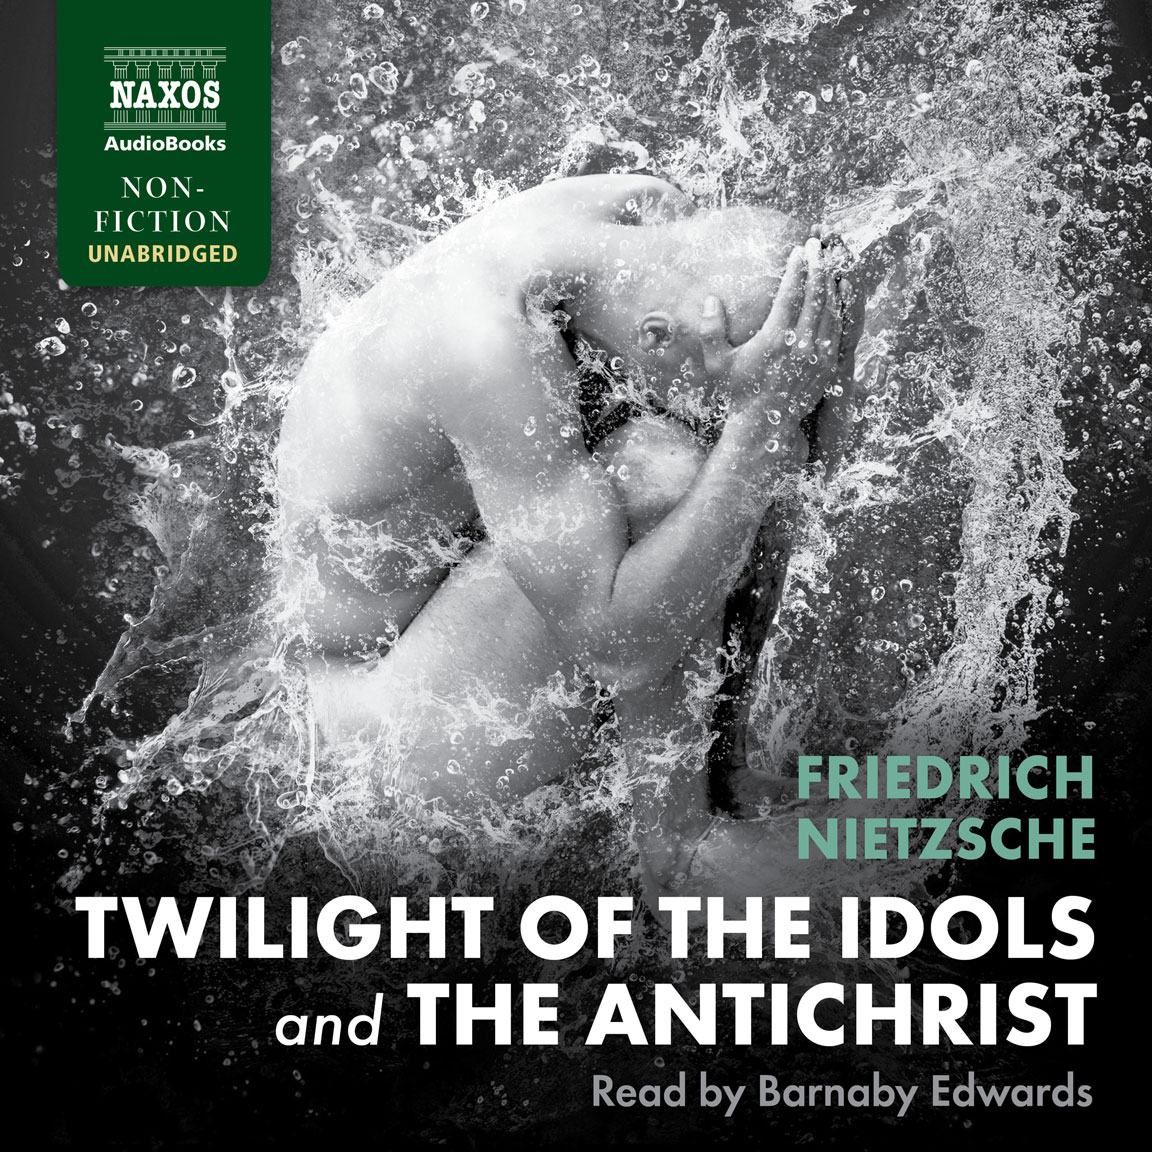 Twilight of the Idols and The Antichrist (unabridged)